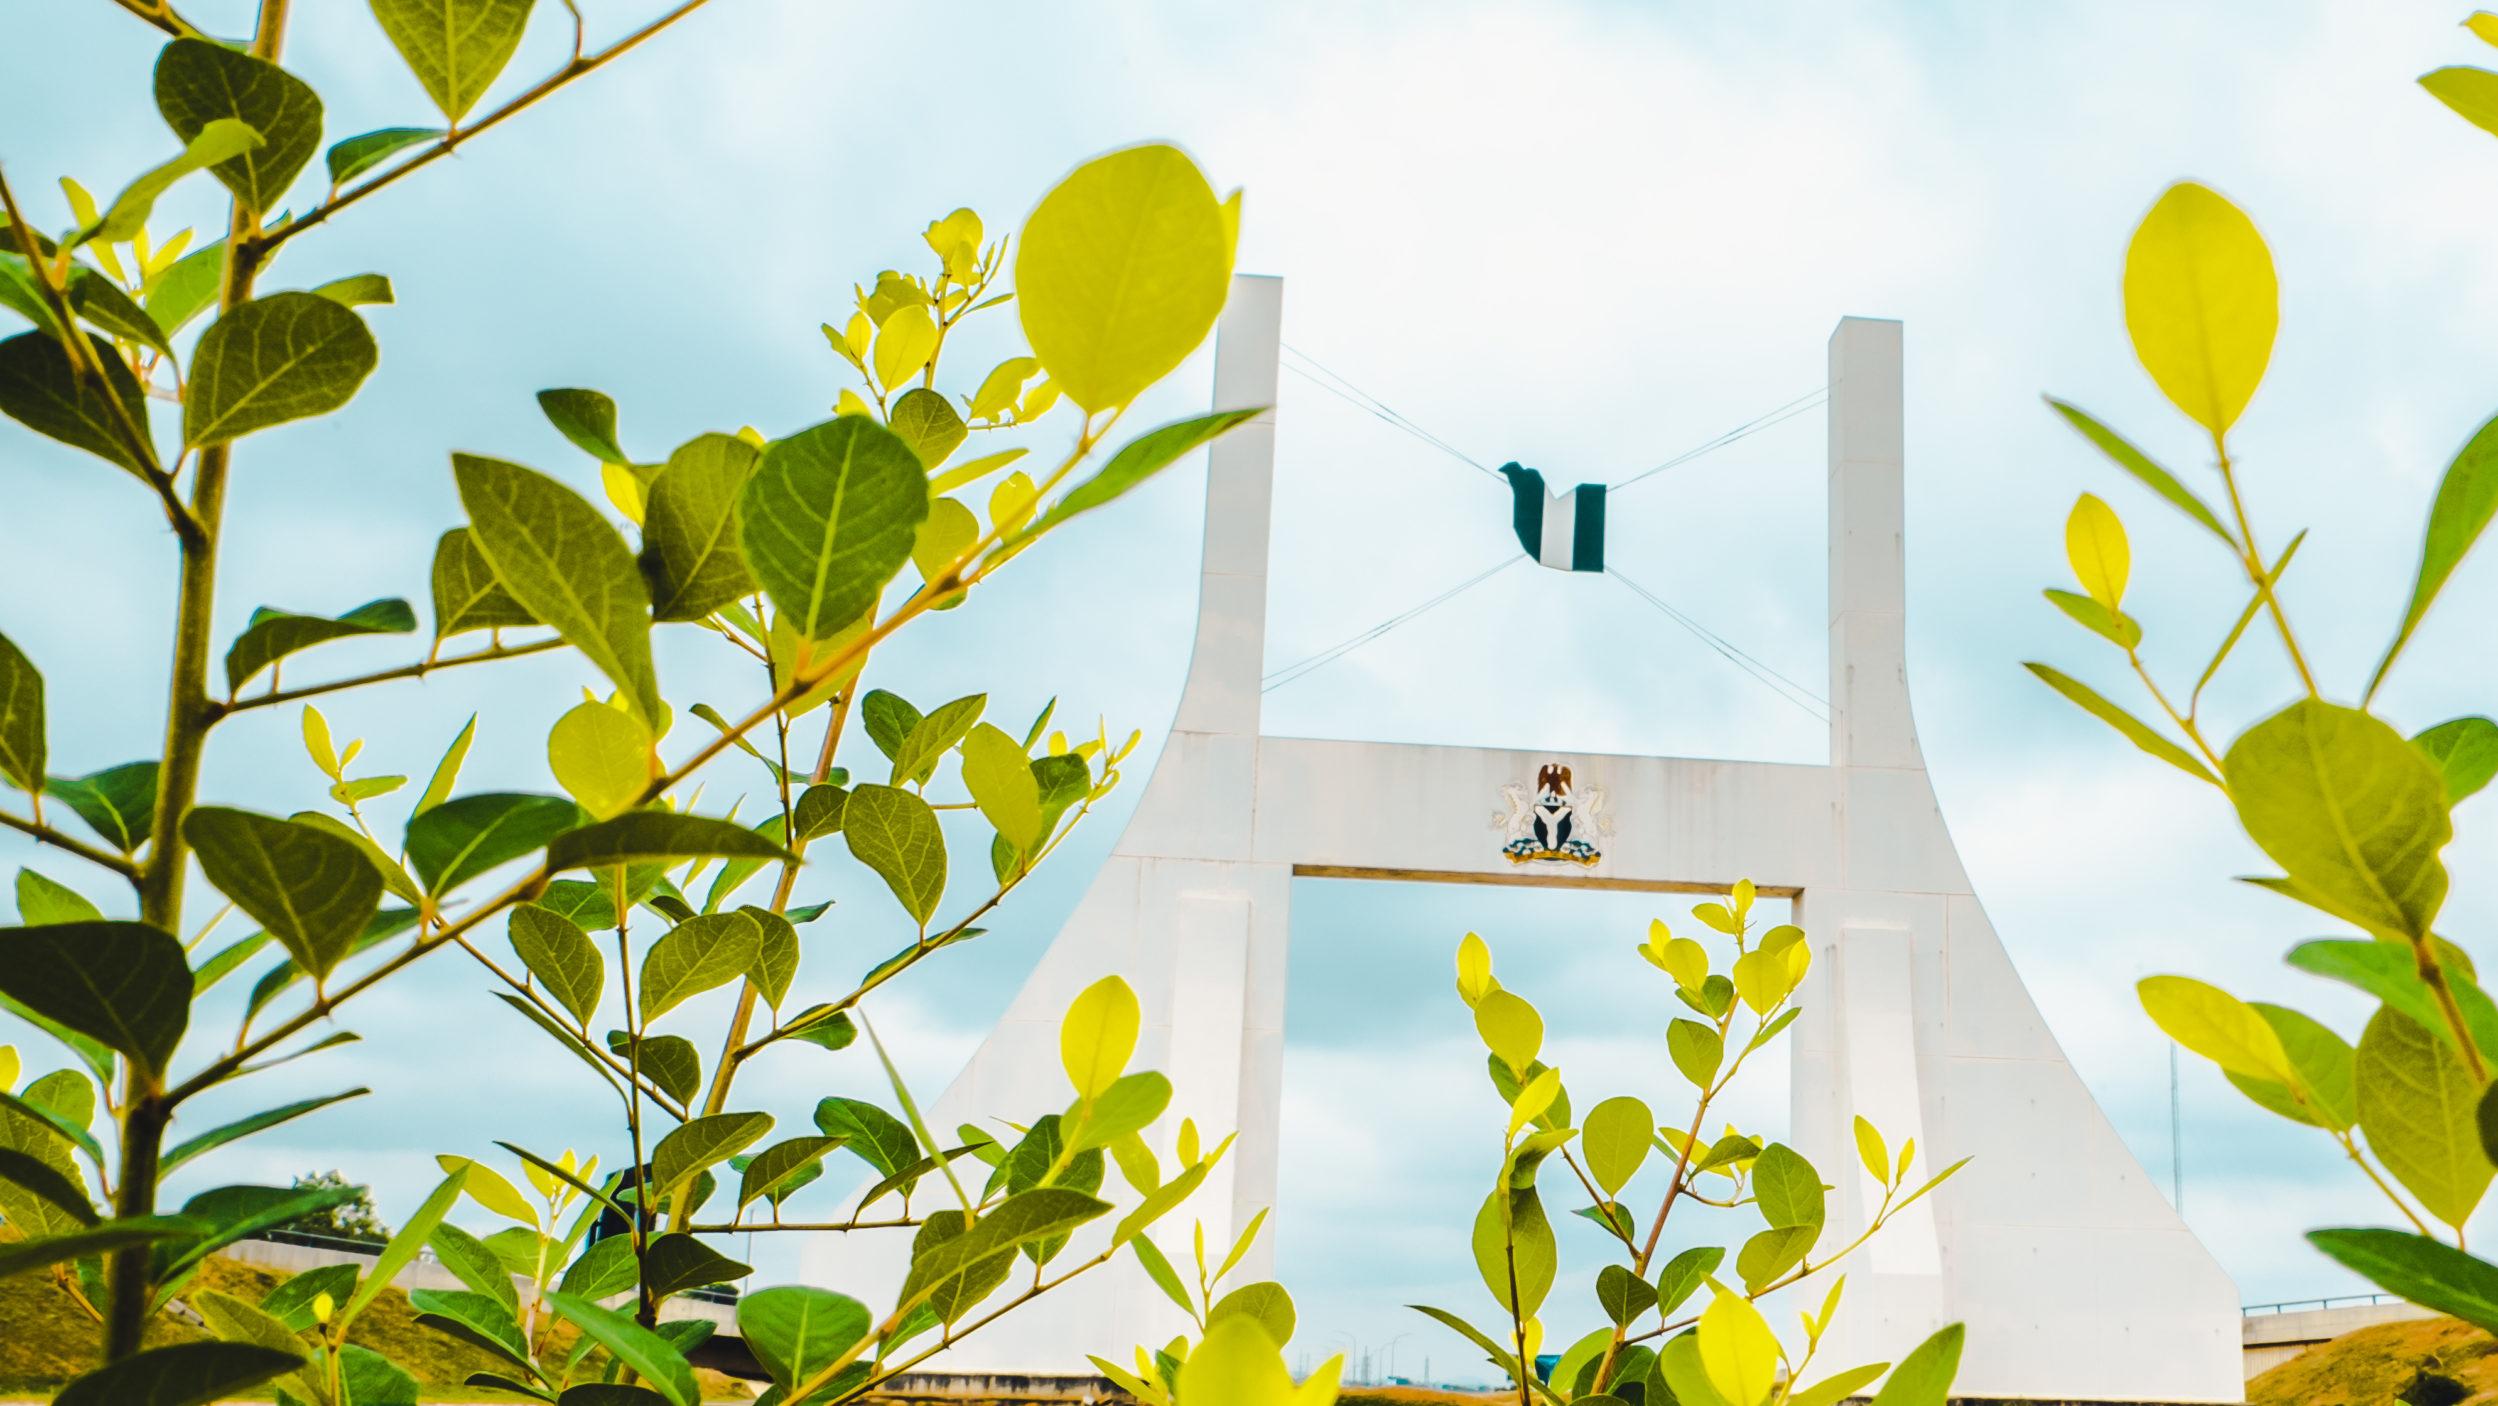 Nigeria [shutterstock]